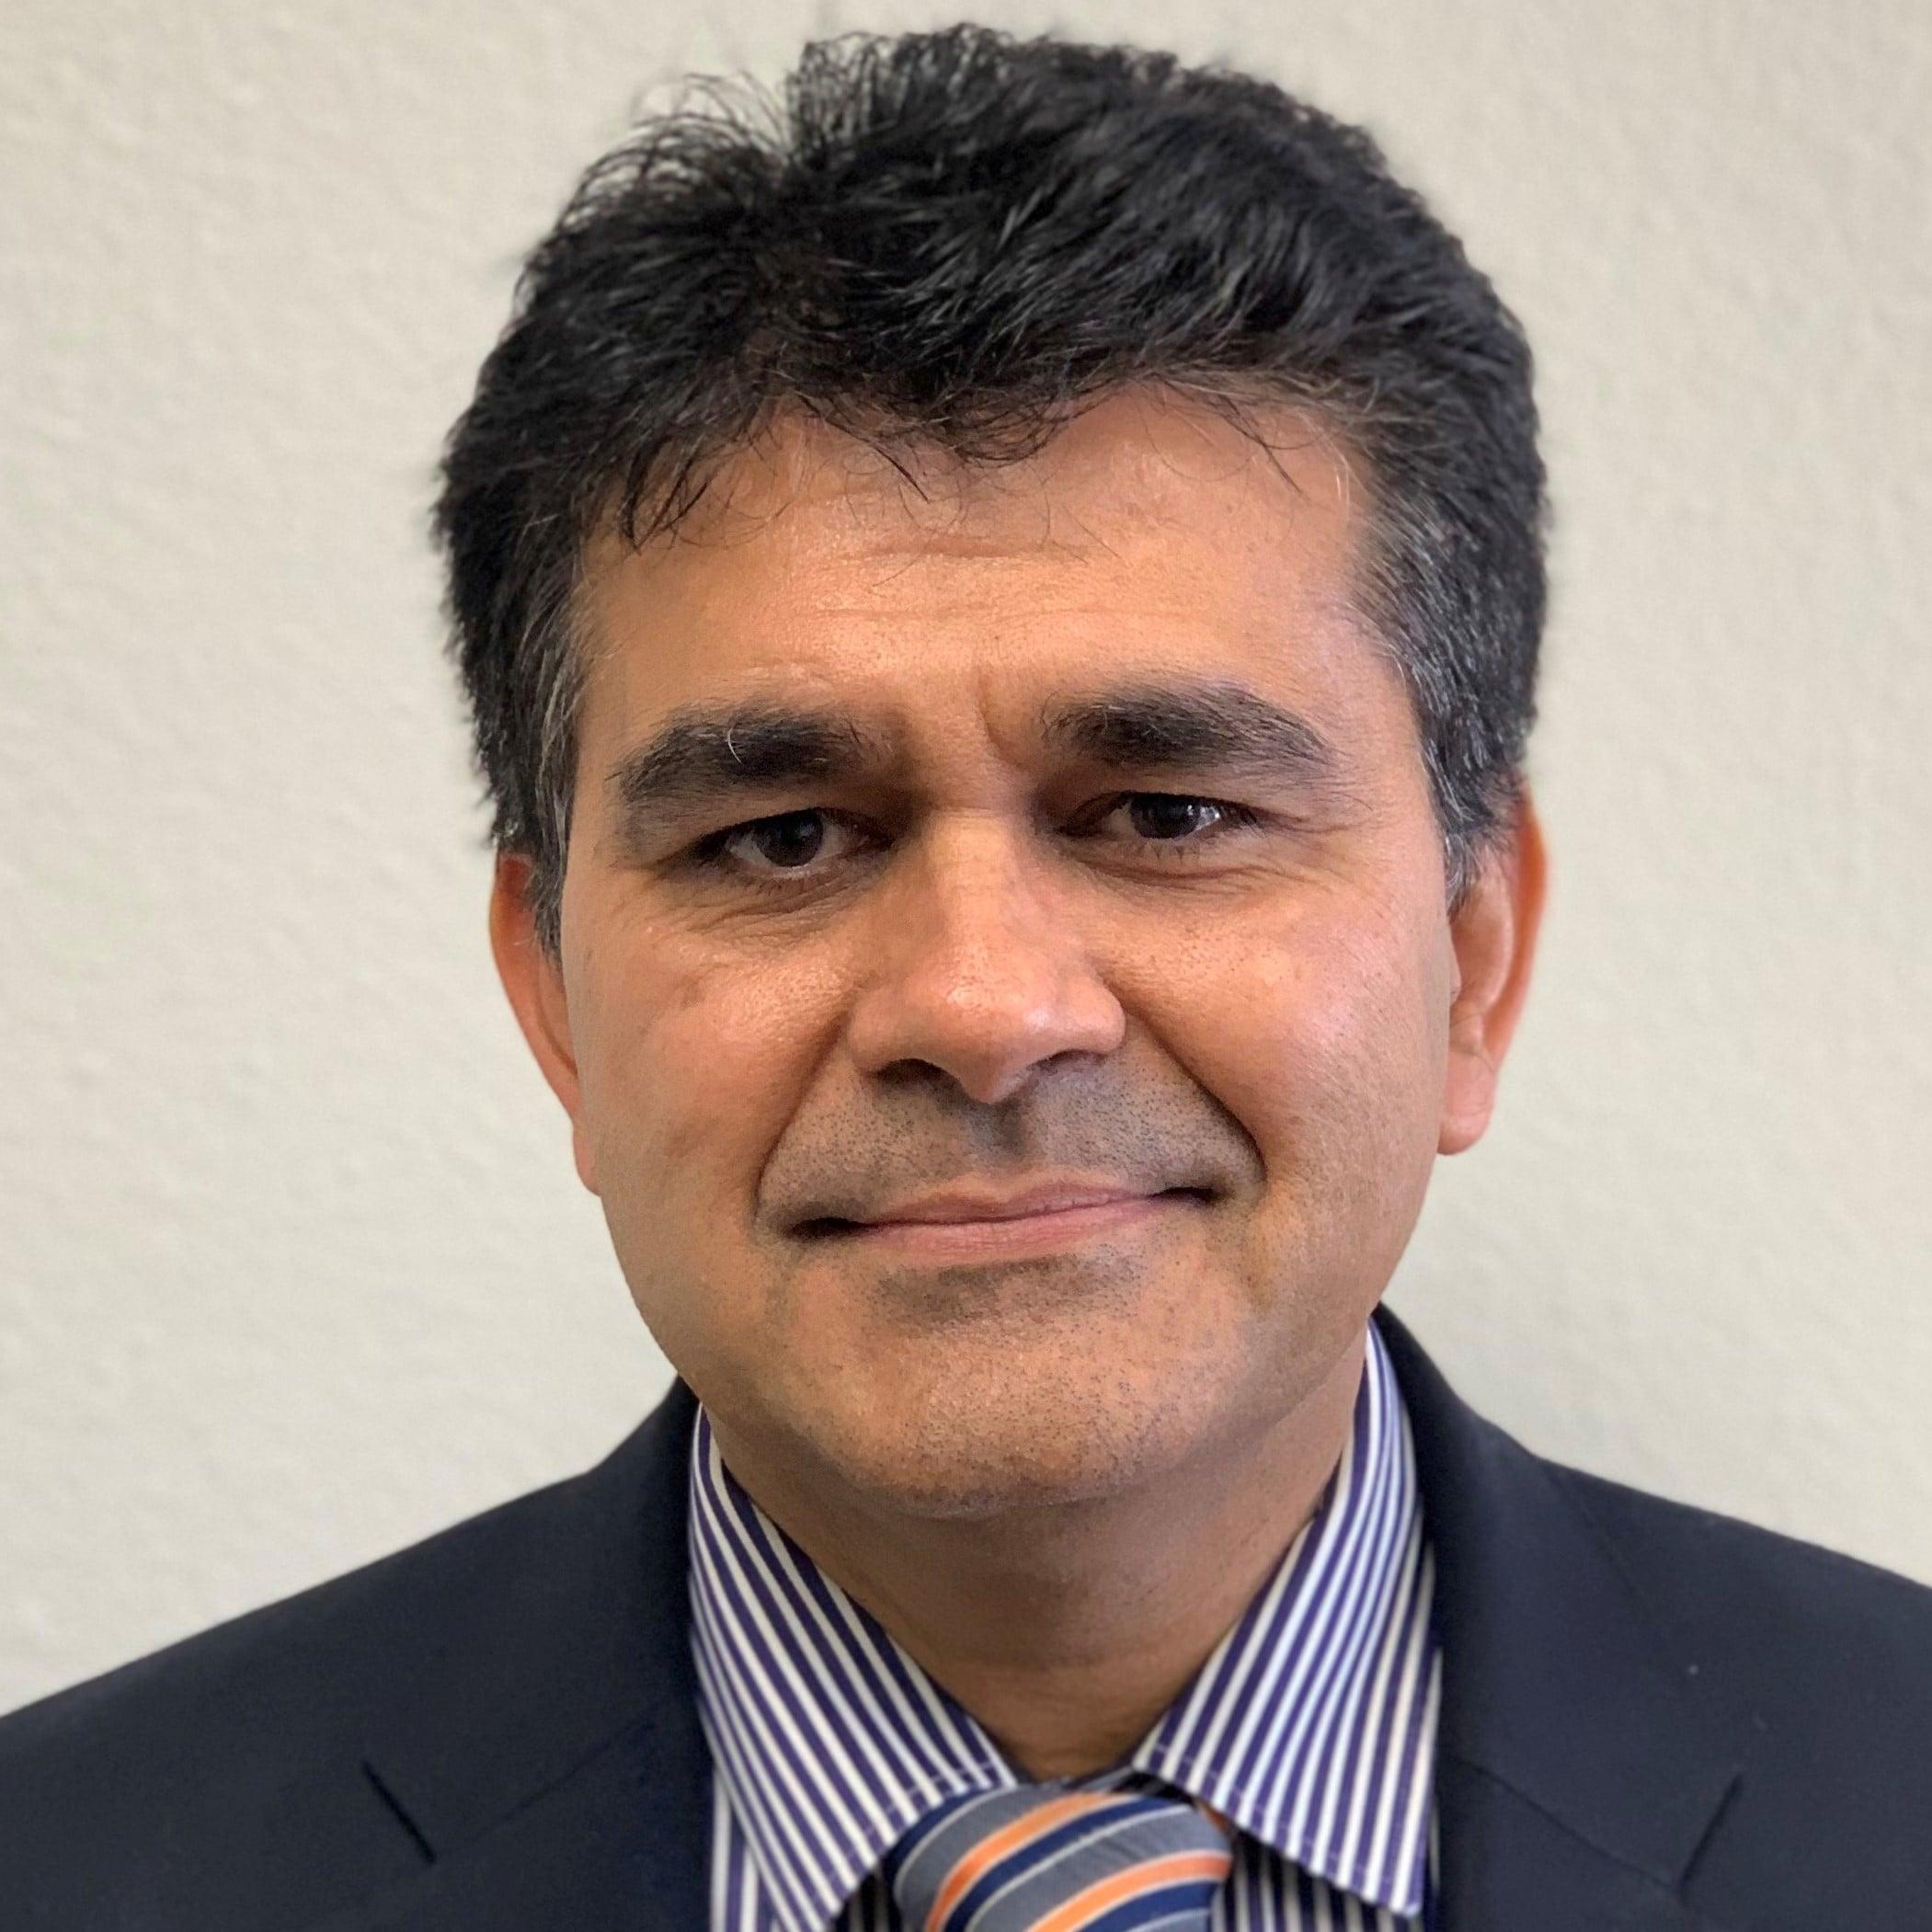 Dr. Vivaik Tyagi MD